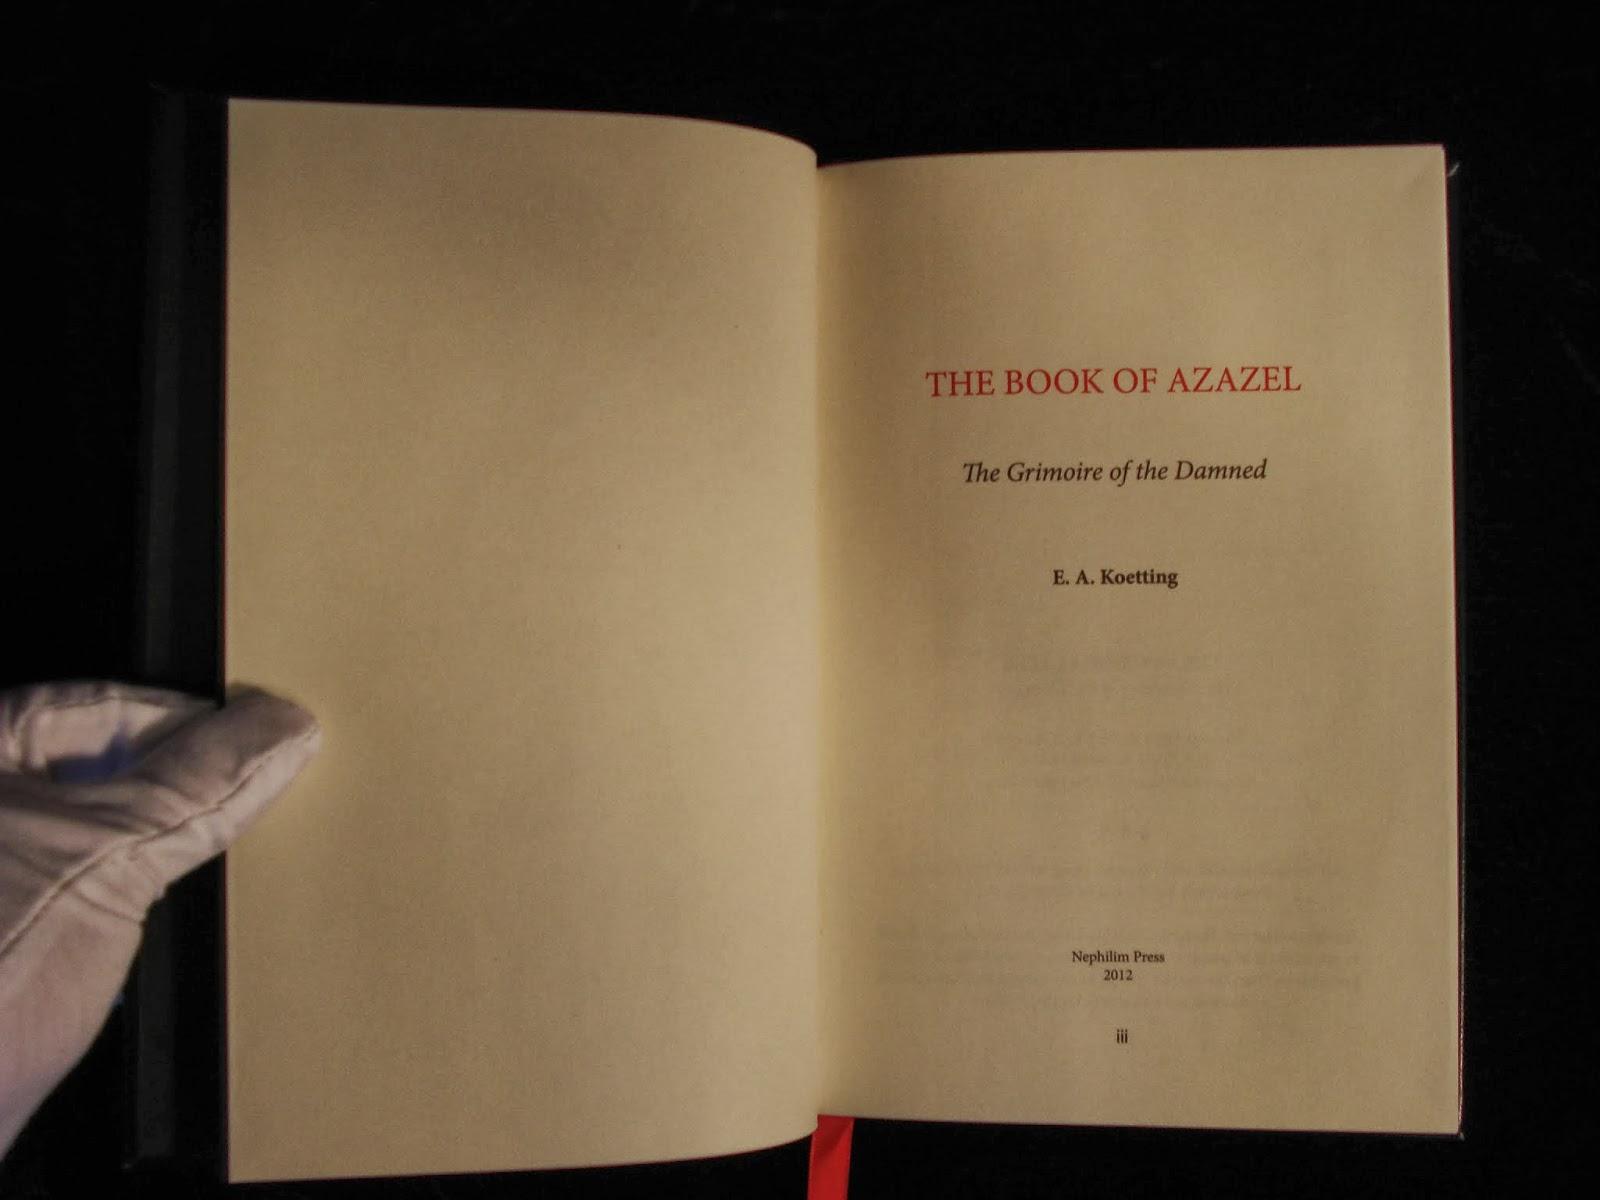 BALKAN'S ARCANE BINDINGS: The Book of Azazel: The Grimoire